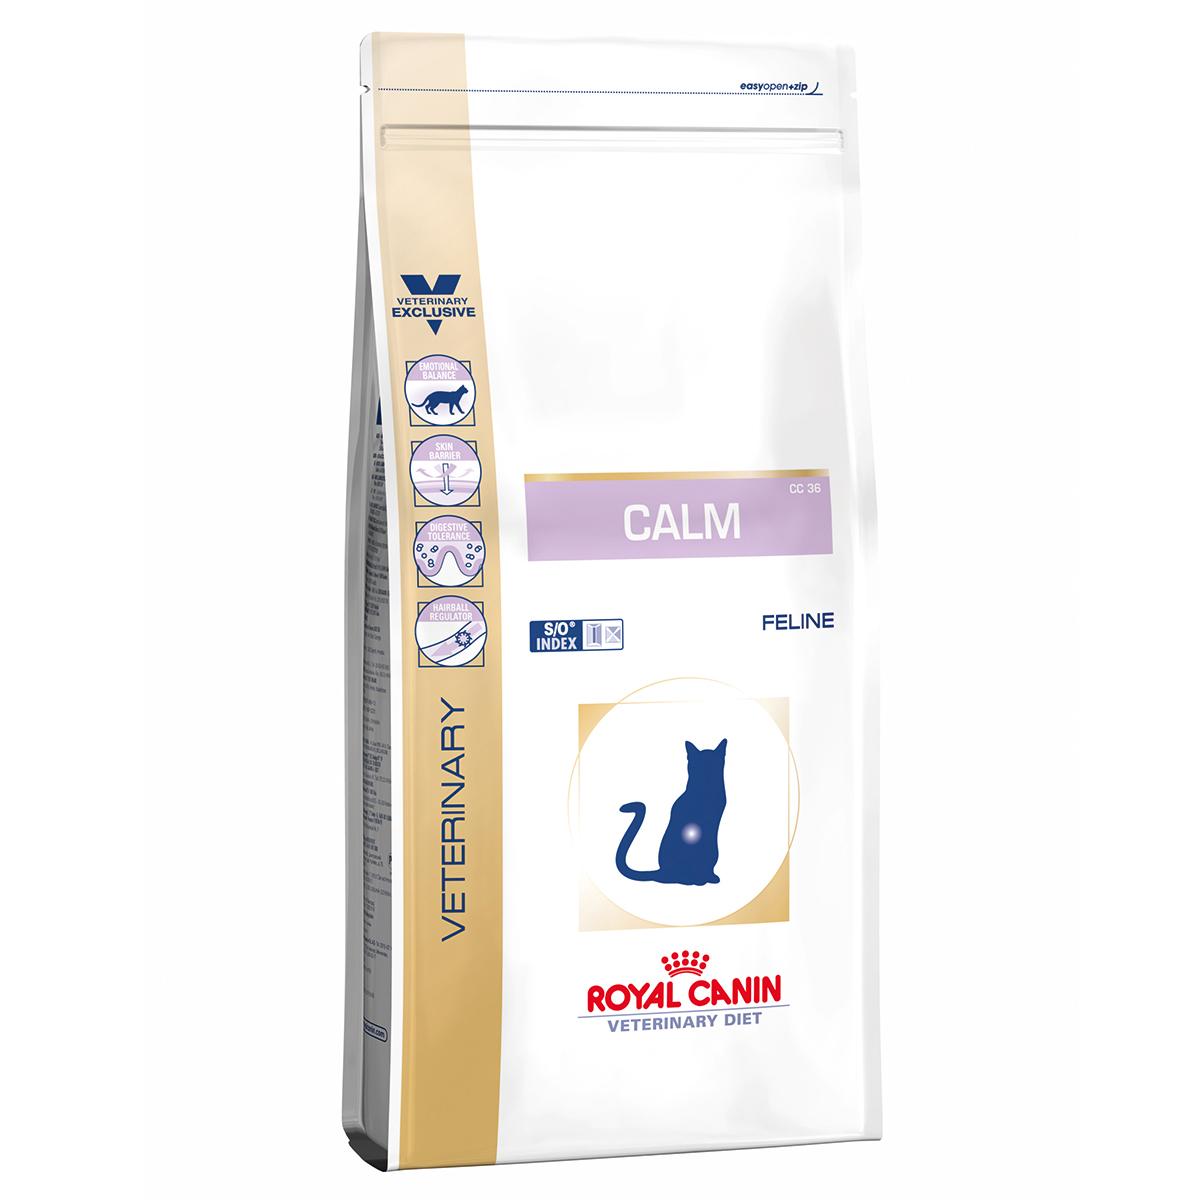 Royal Canin Calm Cat 4 kg imagine